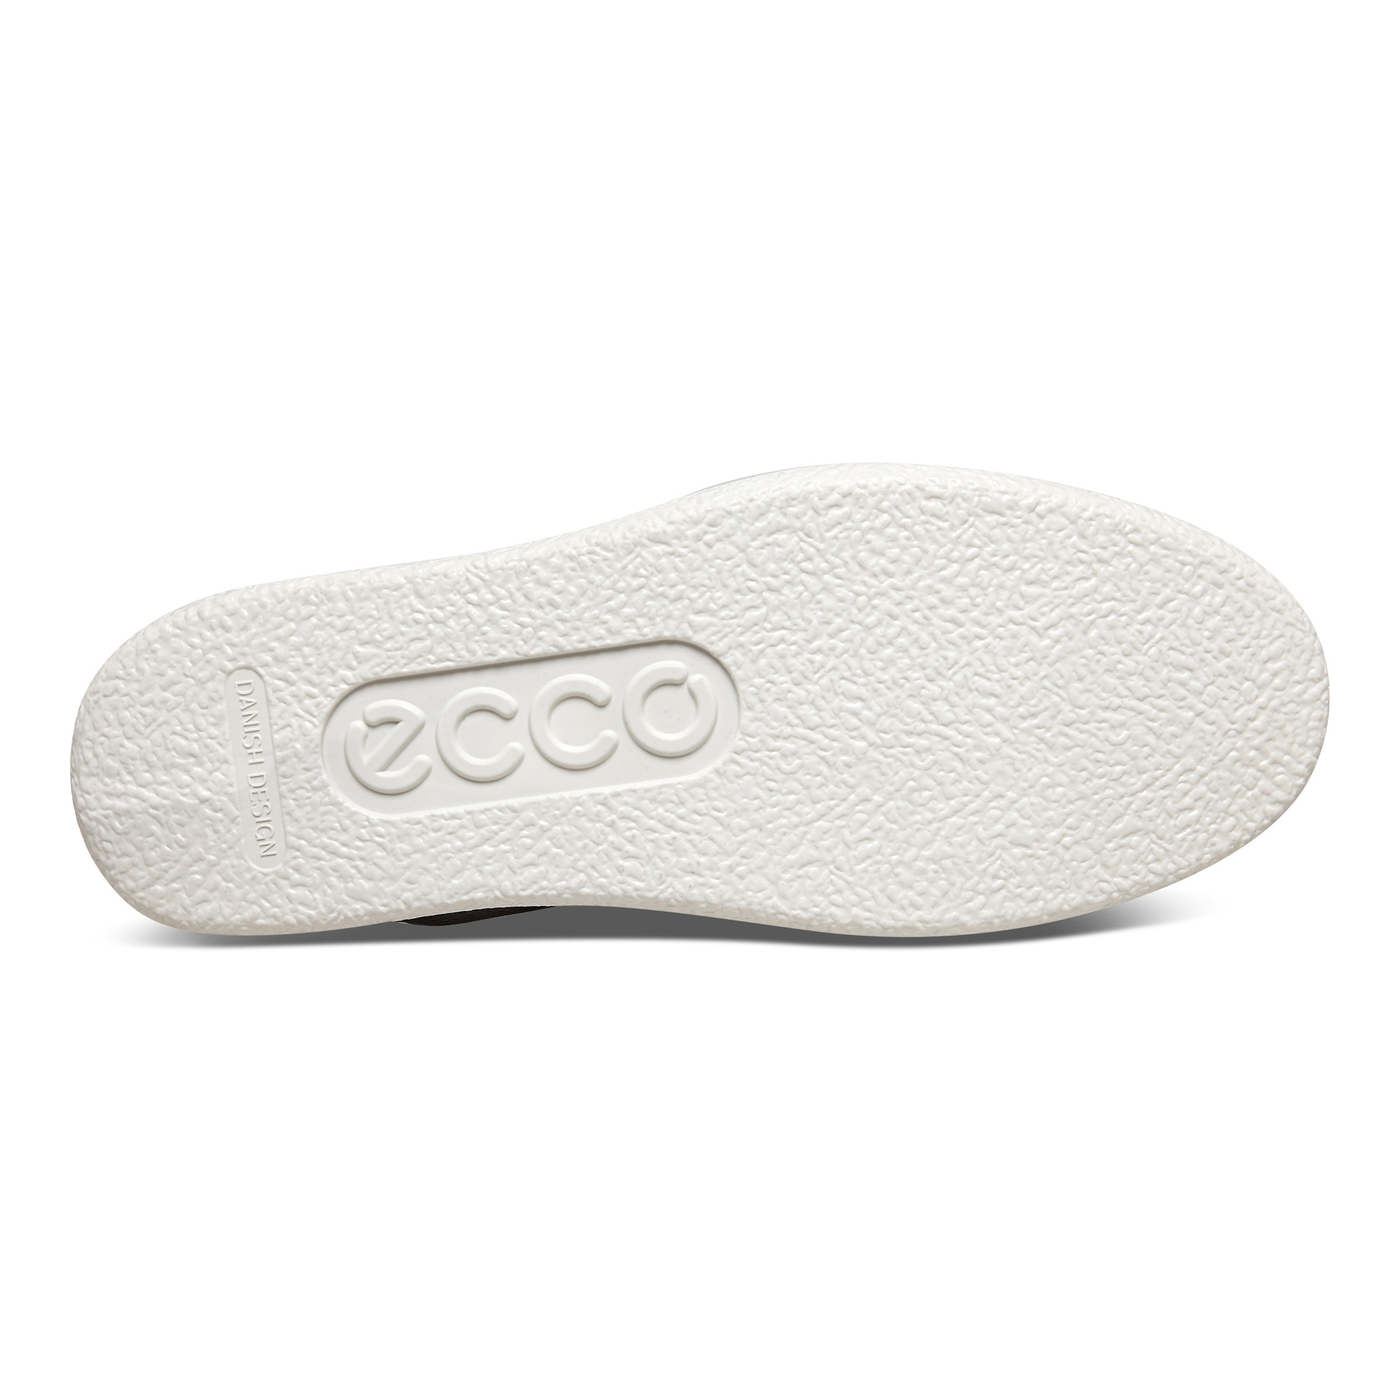 ECCO Soft 1 W High Top